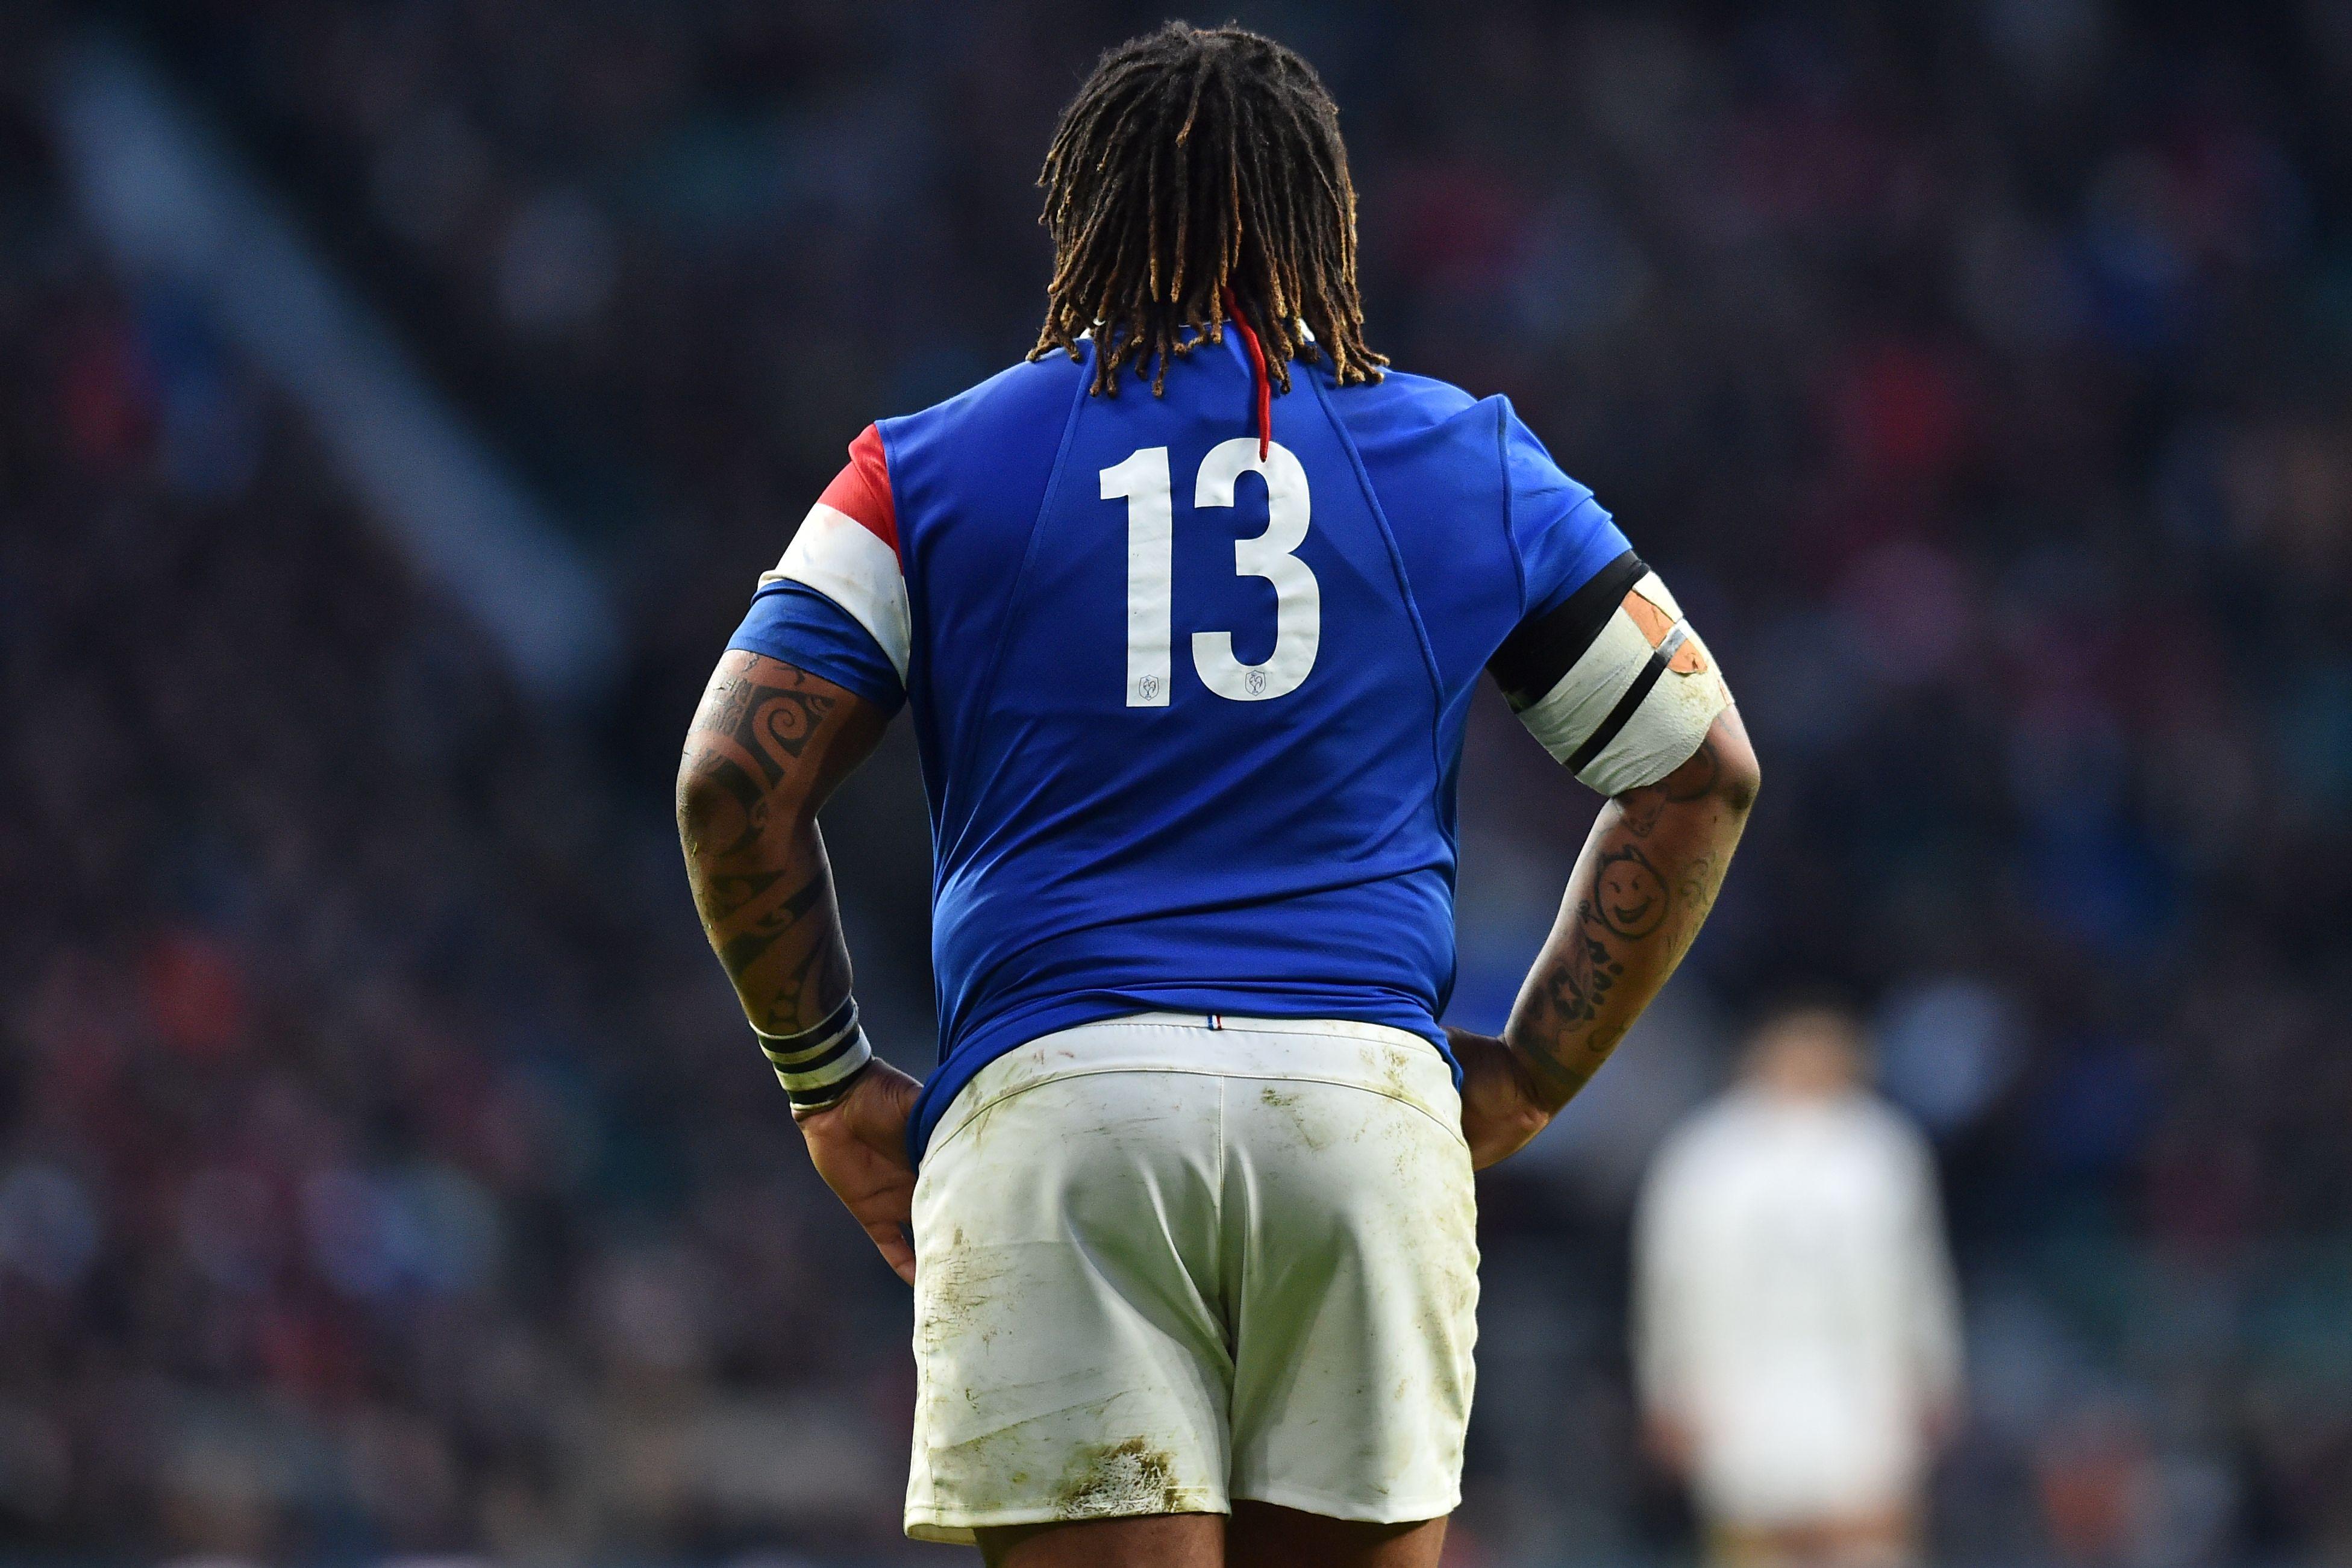 Rugby - 6 Nations - Bastareaud emporté par la bourrasque à Twickenham